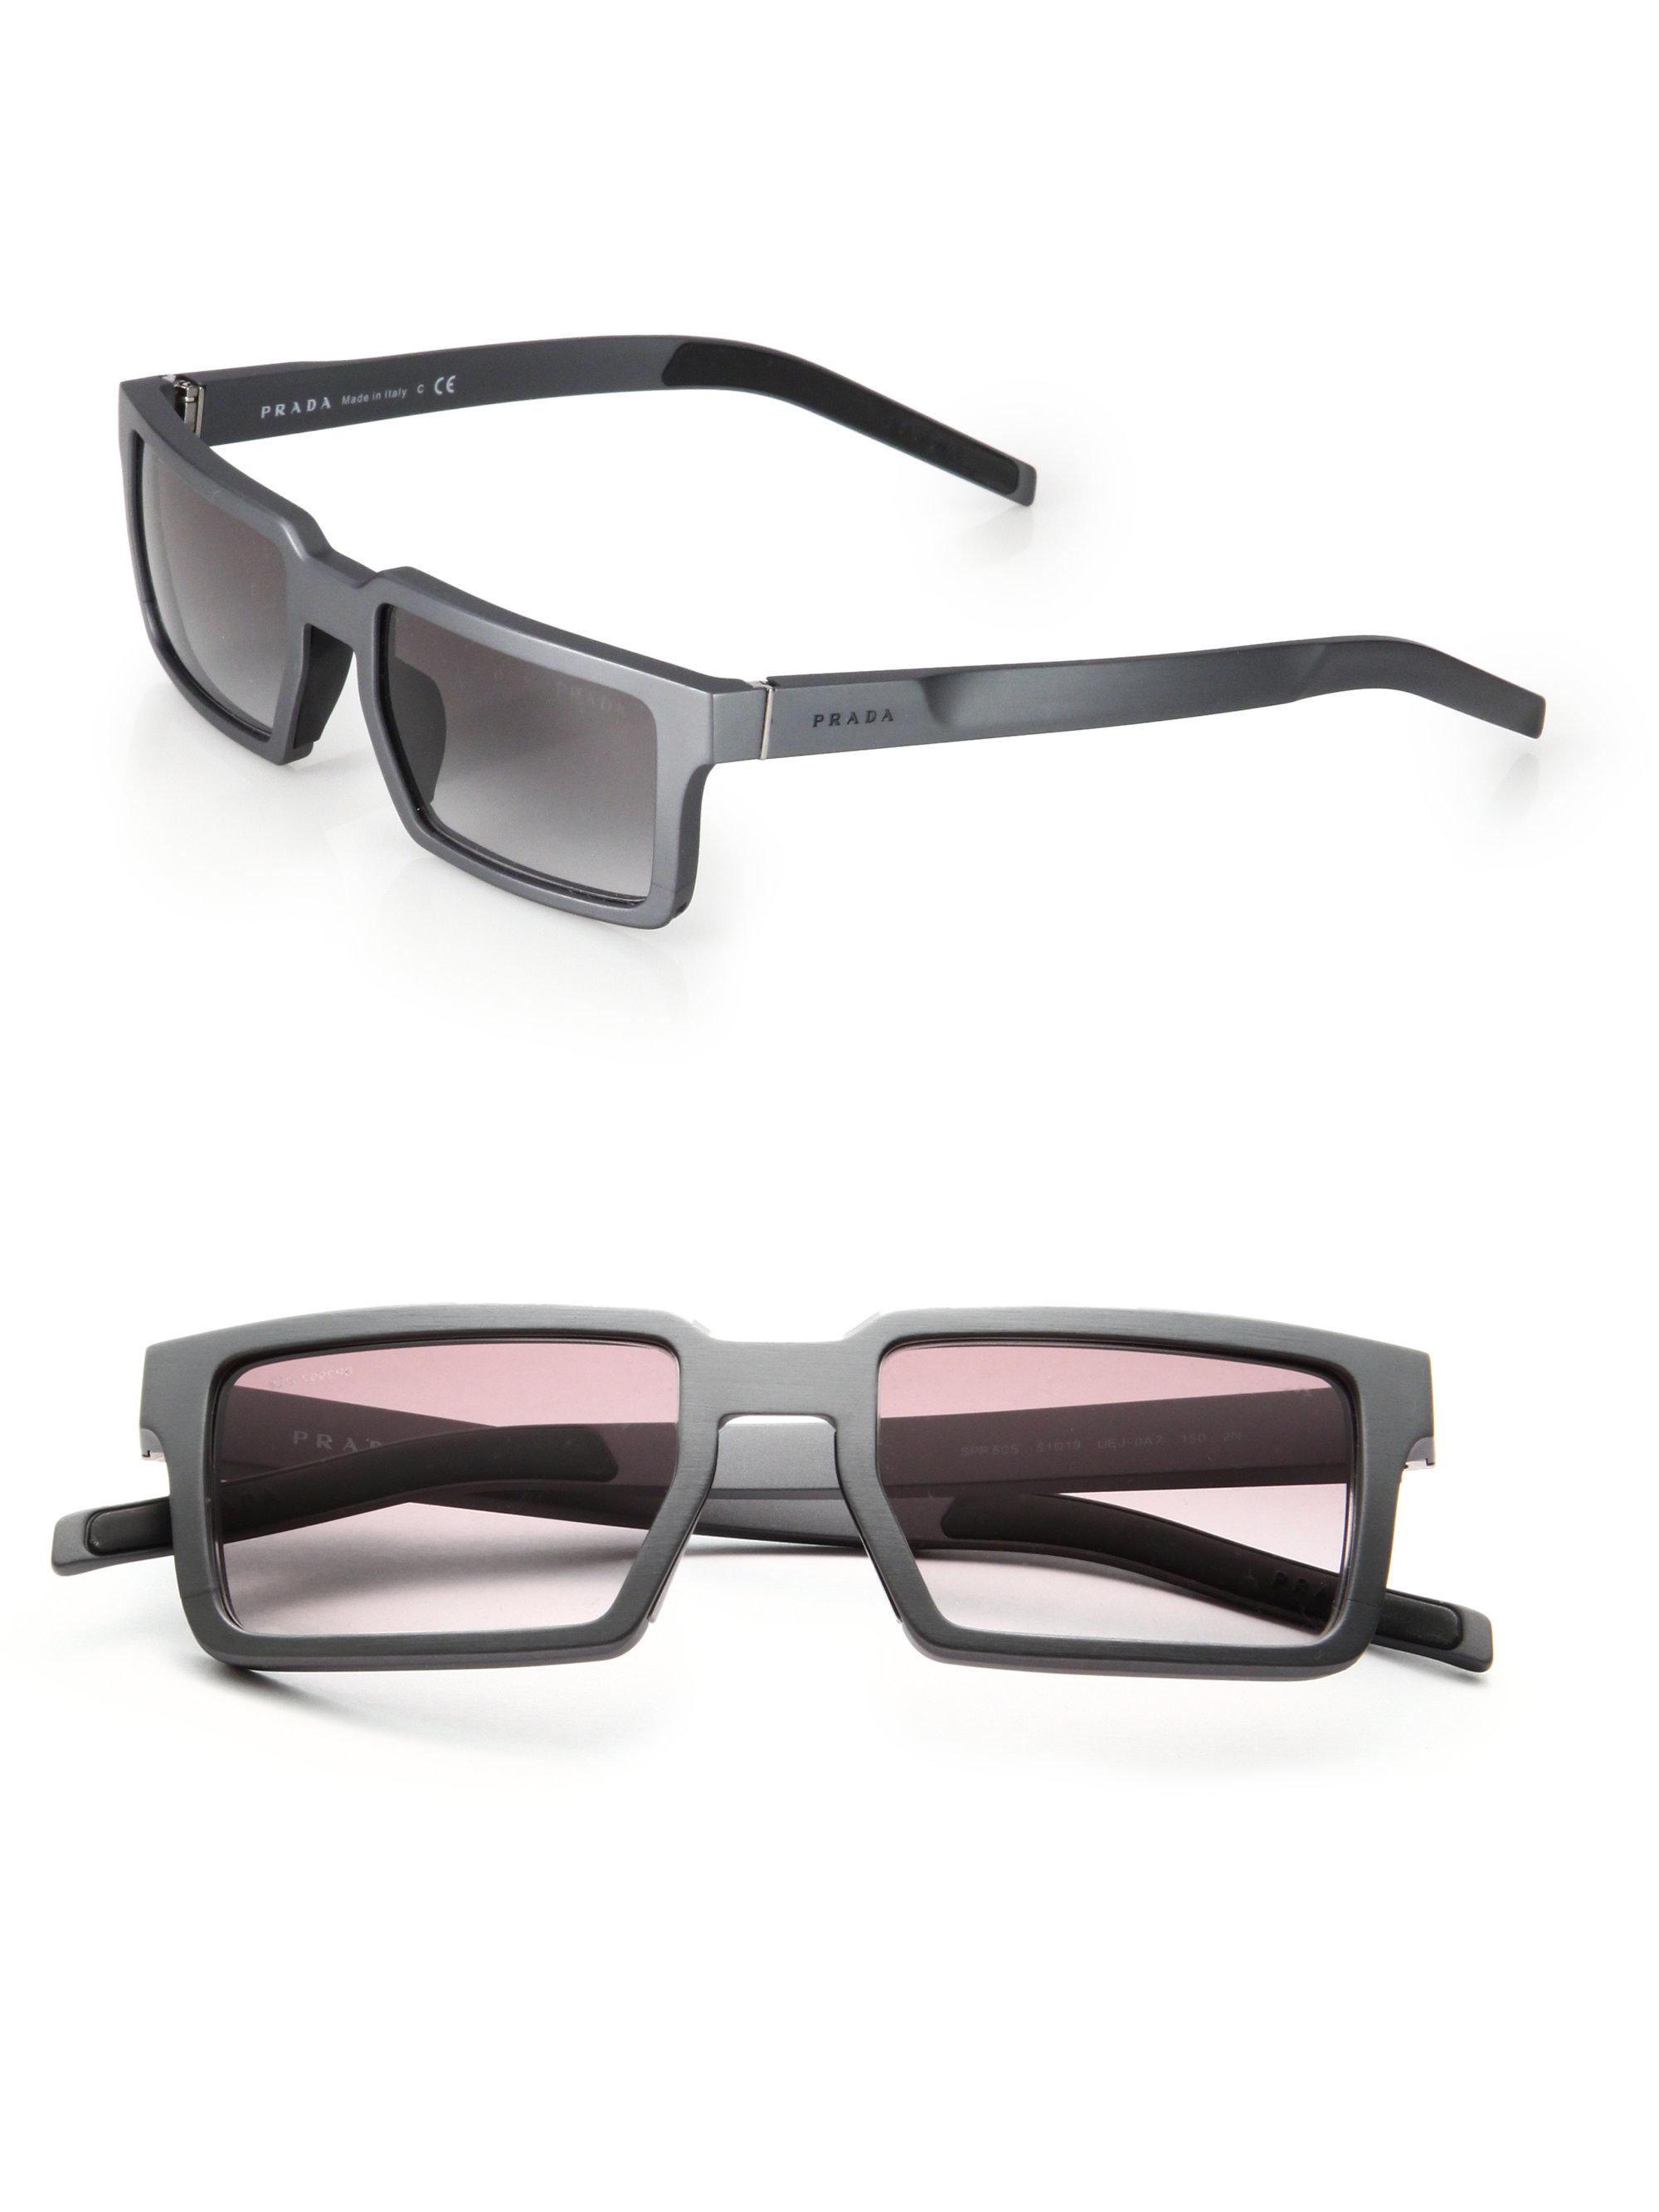 a322fb34d944 ... discount code for lyst prada 51mm rectangle aluminum sunglasses in gray  for men 5d74e a457e